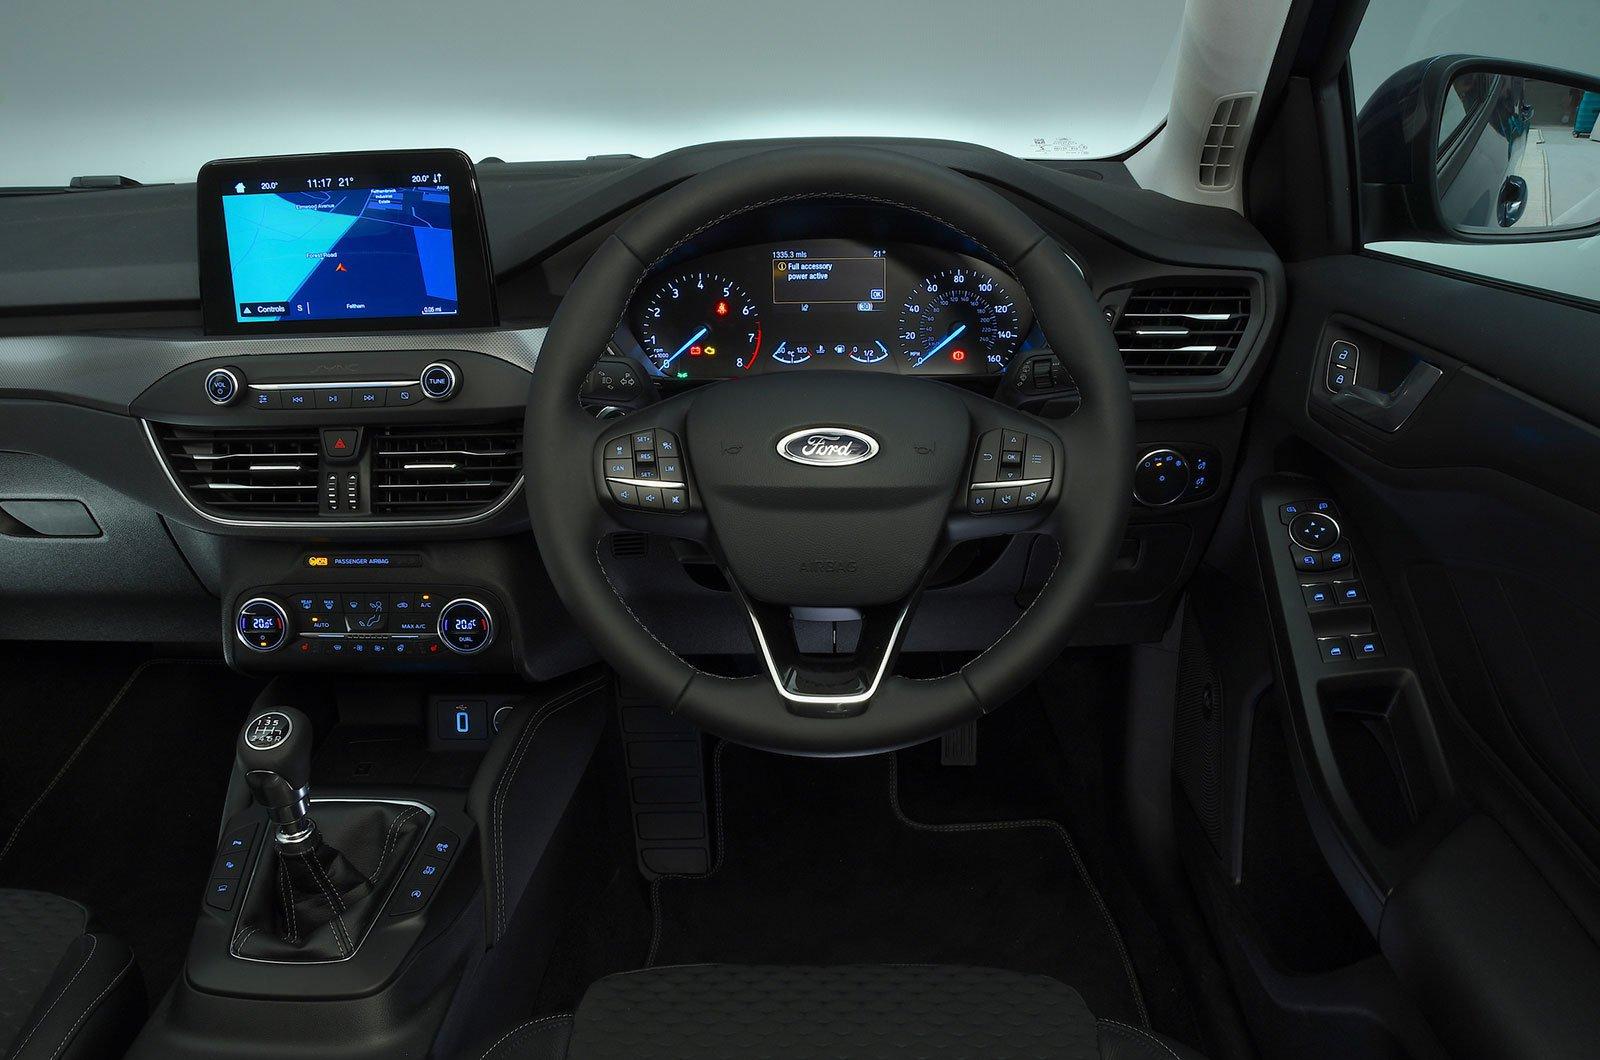 Ford Focus 1.0 Ecoboost 125 Zetec Nav - interior